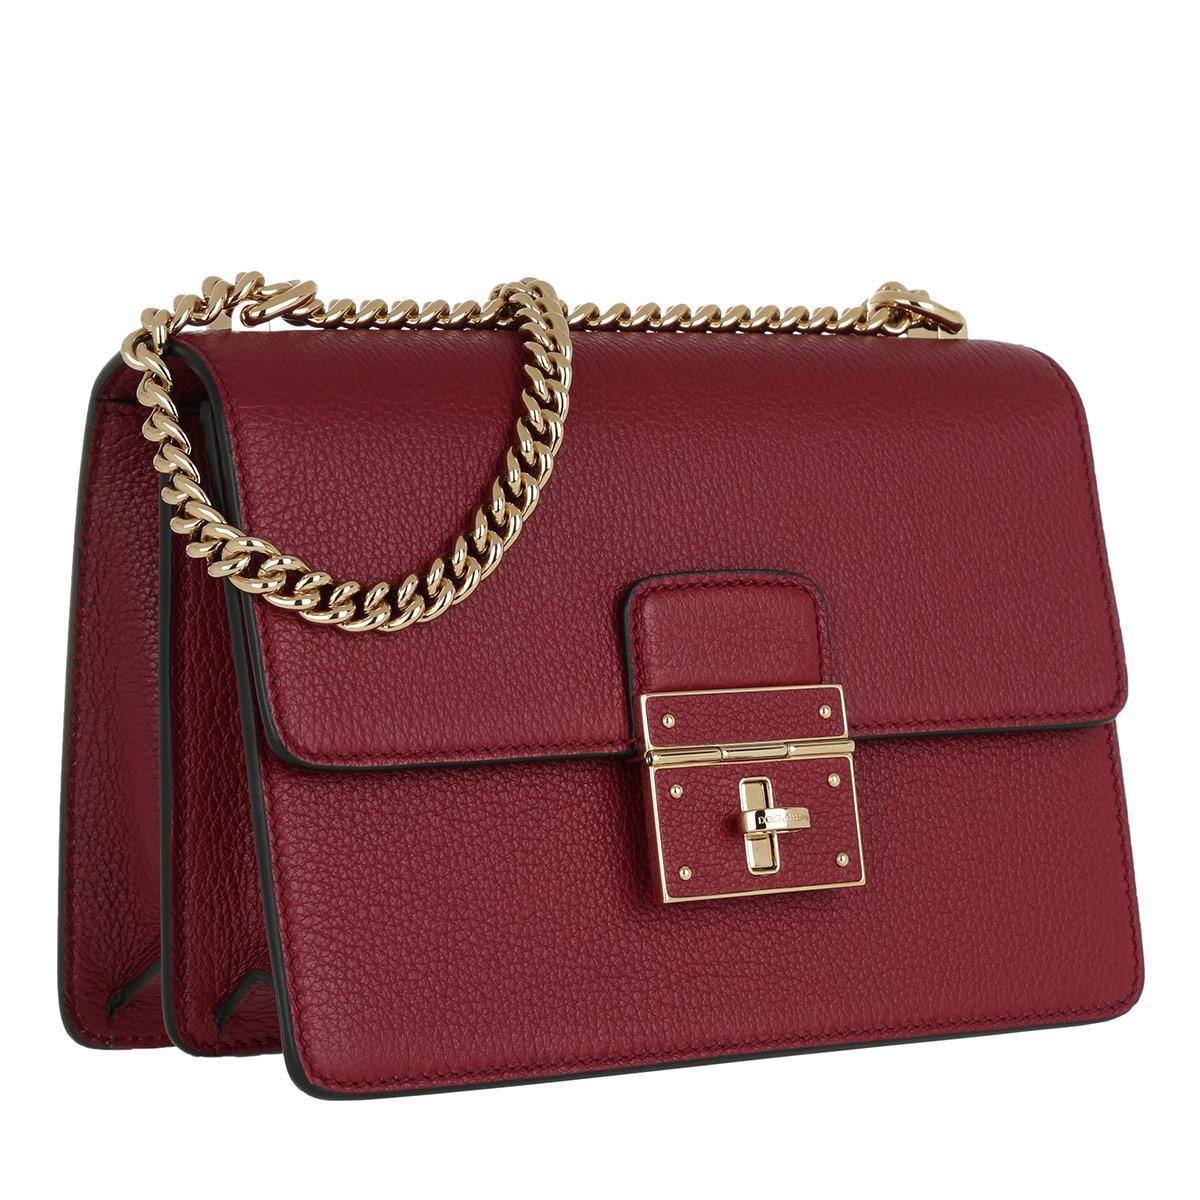 Dolce & Gabbana Leather Rosalia Crossbody Bag Red